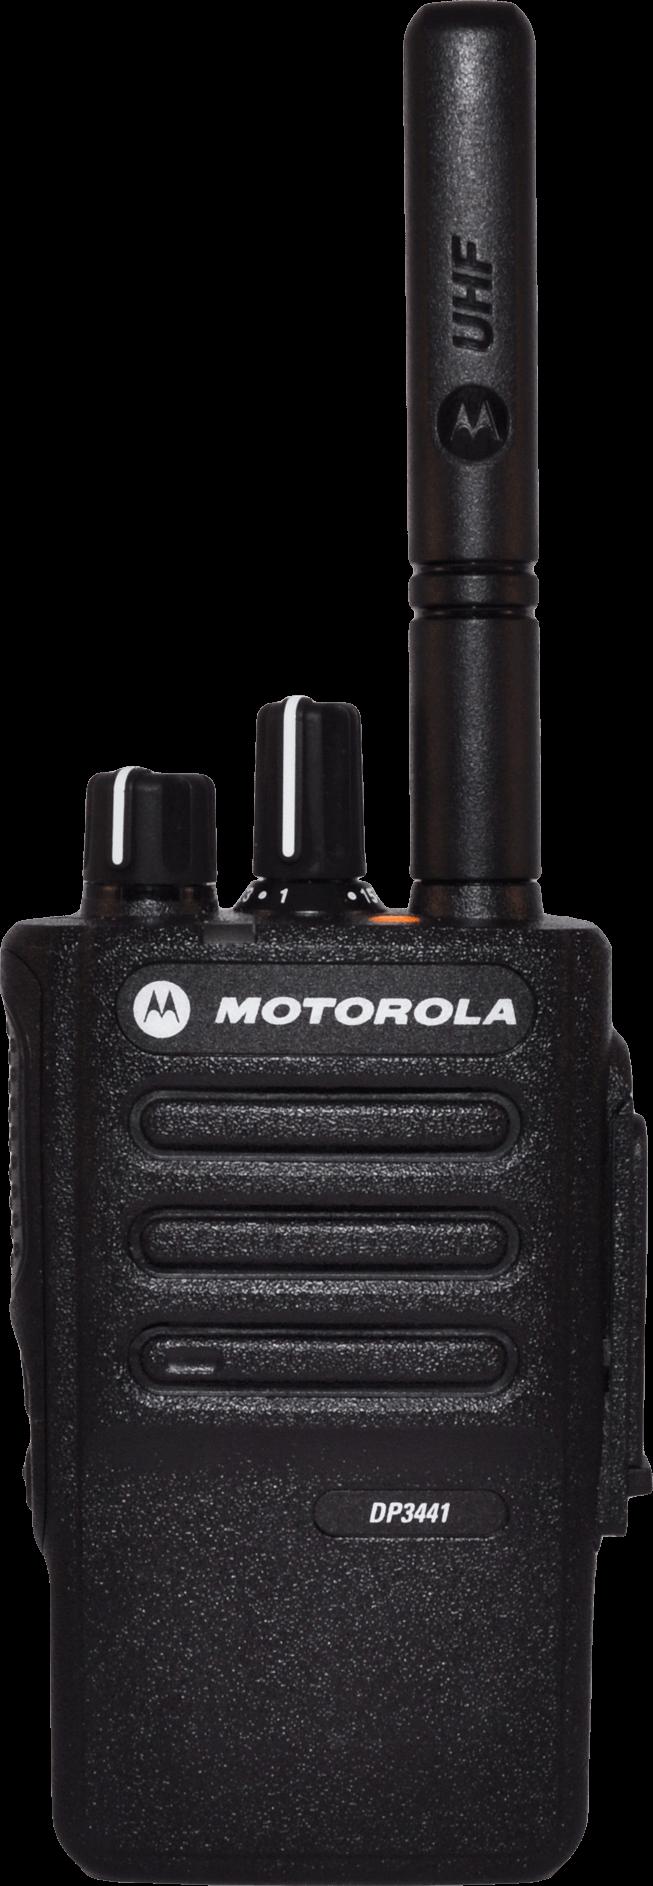 Motorola DP3441e featured image